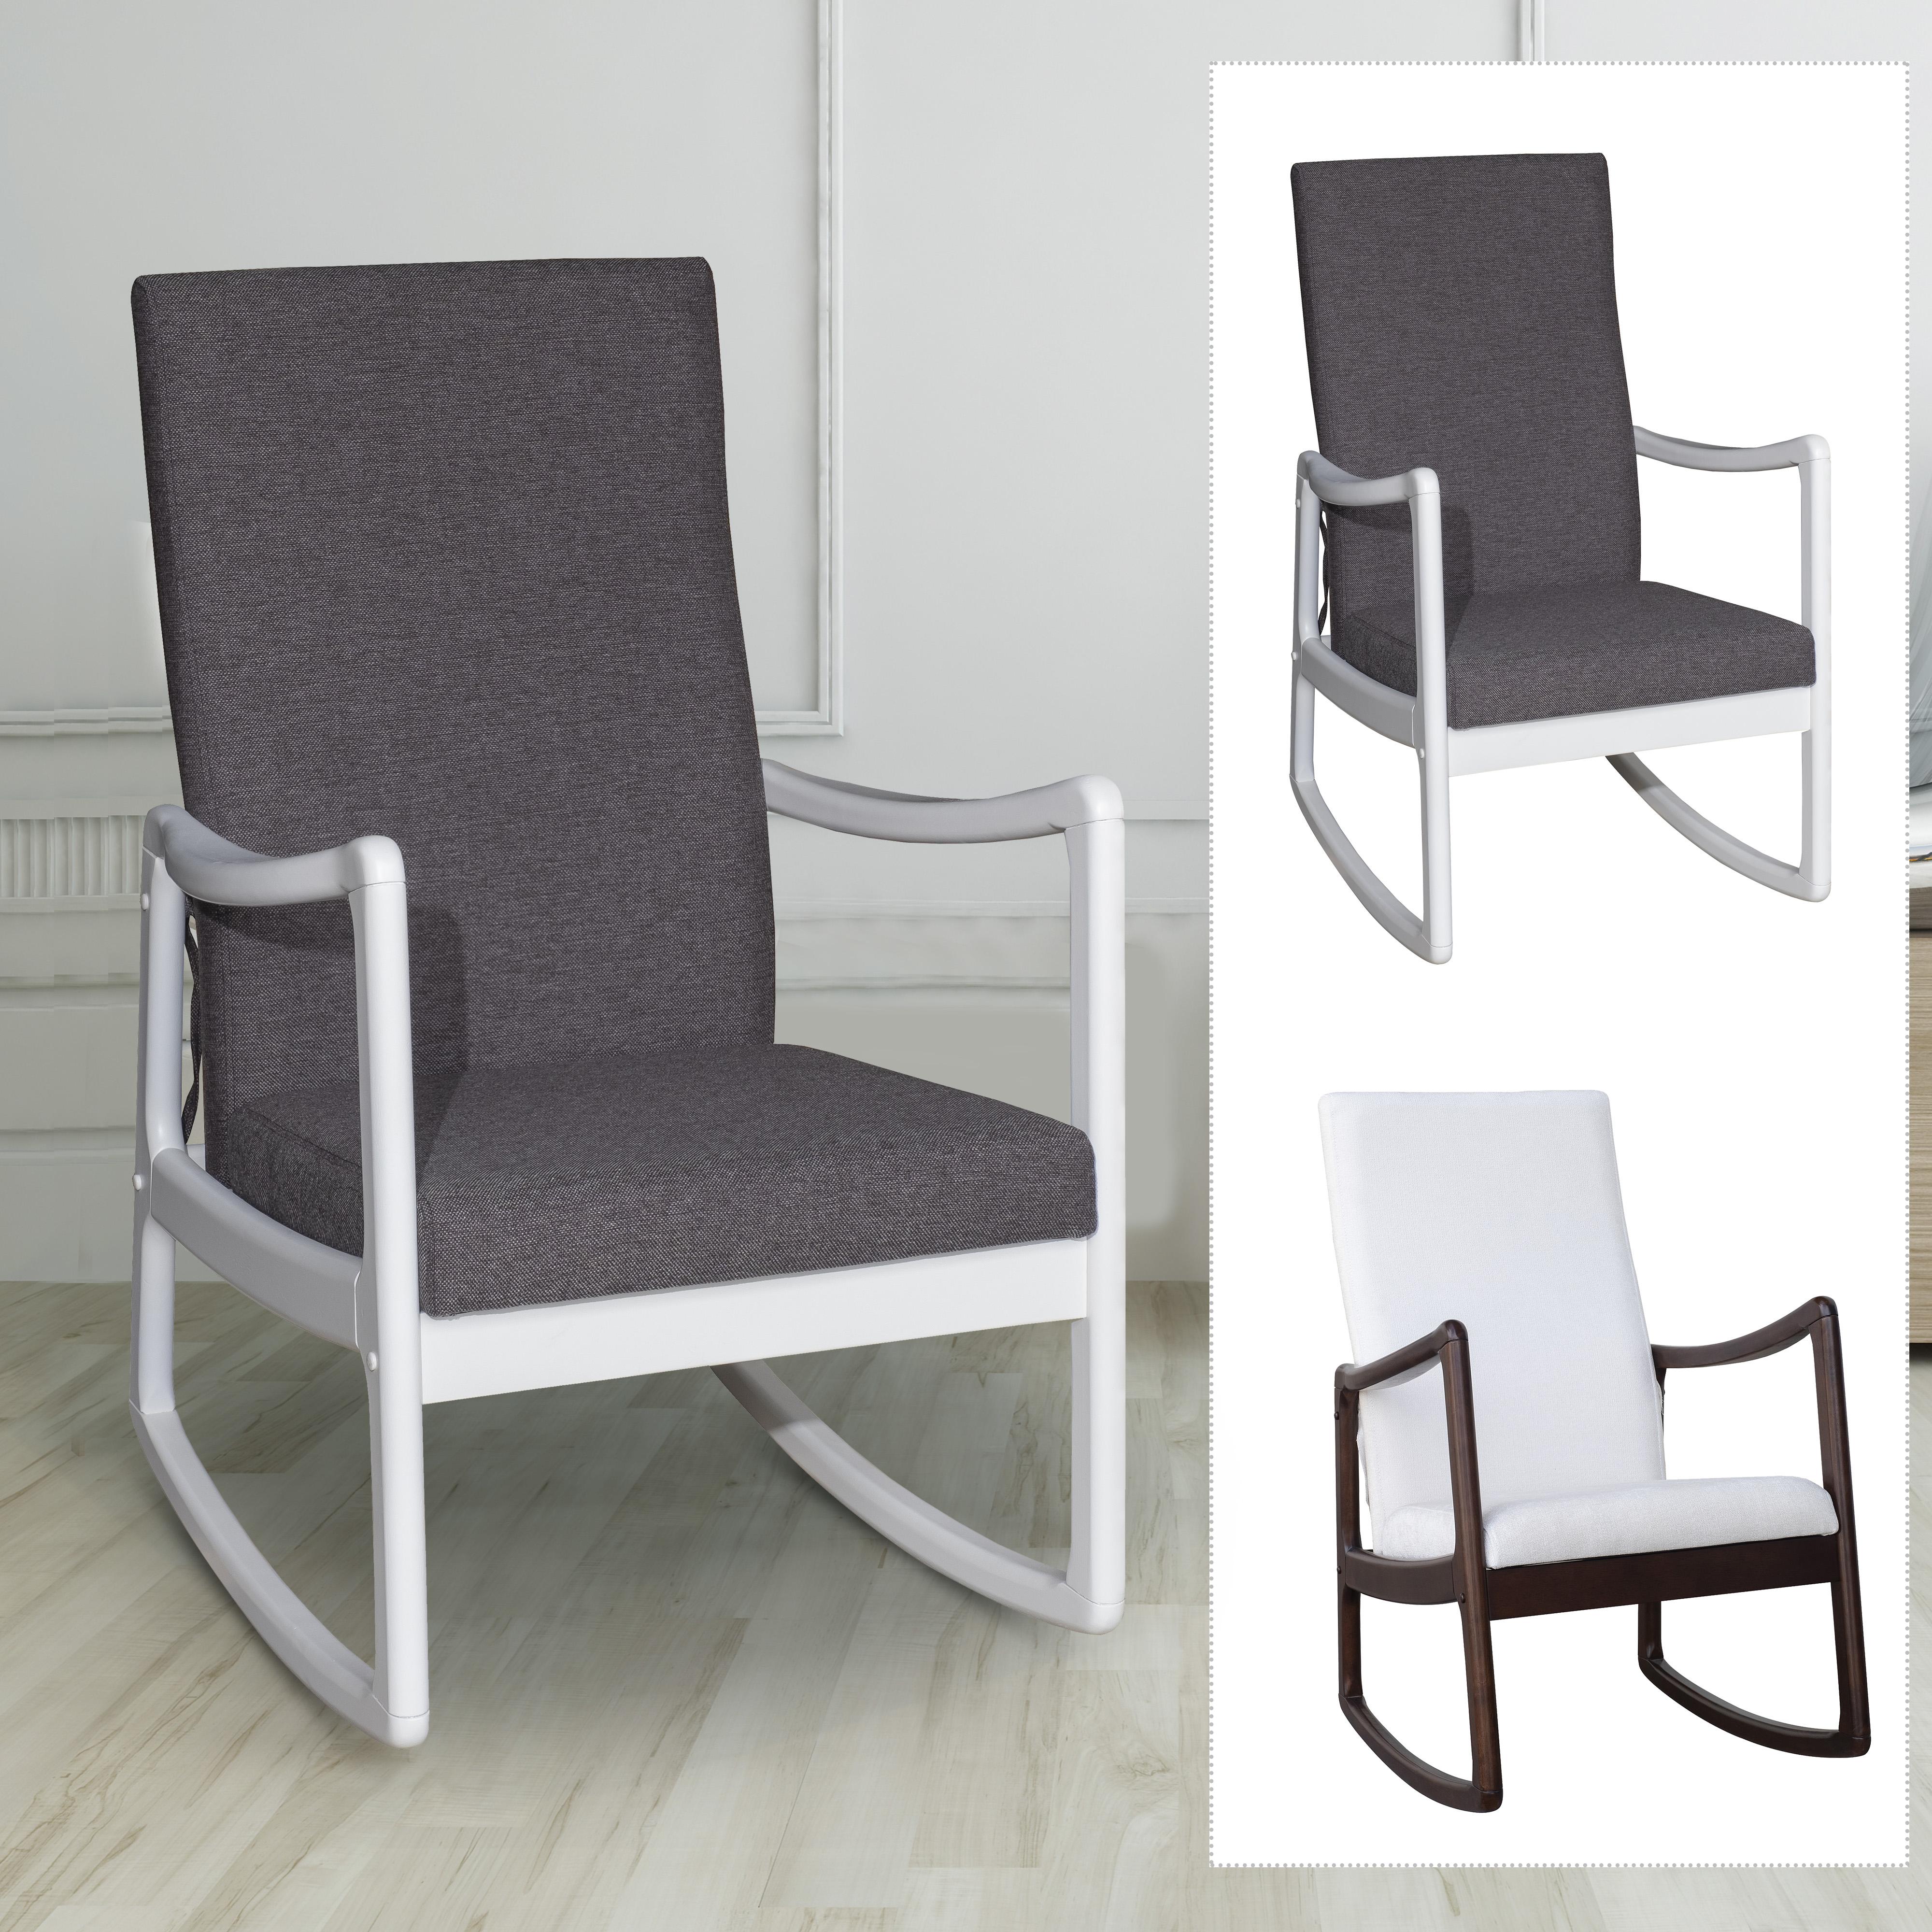 Remarkable Details About Modern Wood Rocking Chair Indoor Porch Furniture Padded Rocker Living Room Seat Ibusinesslaw Wood Chair Design Ideas Ibusinesslaworg